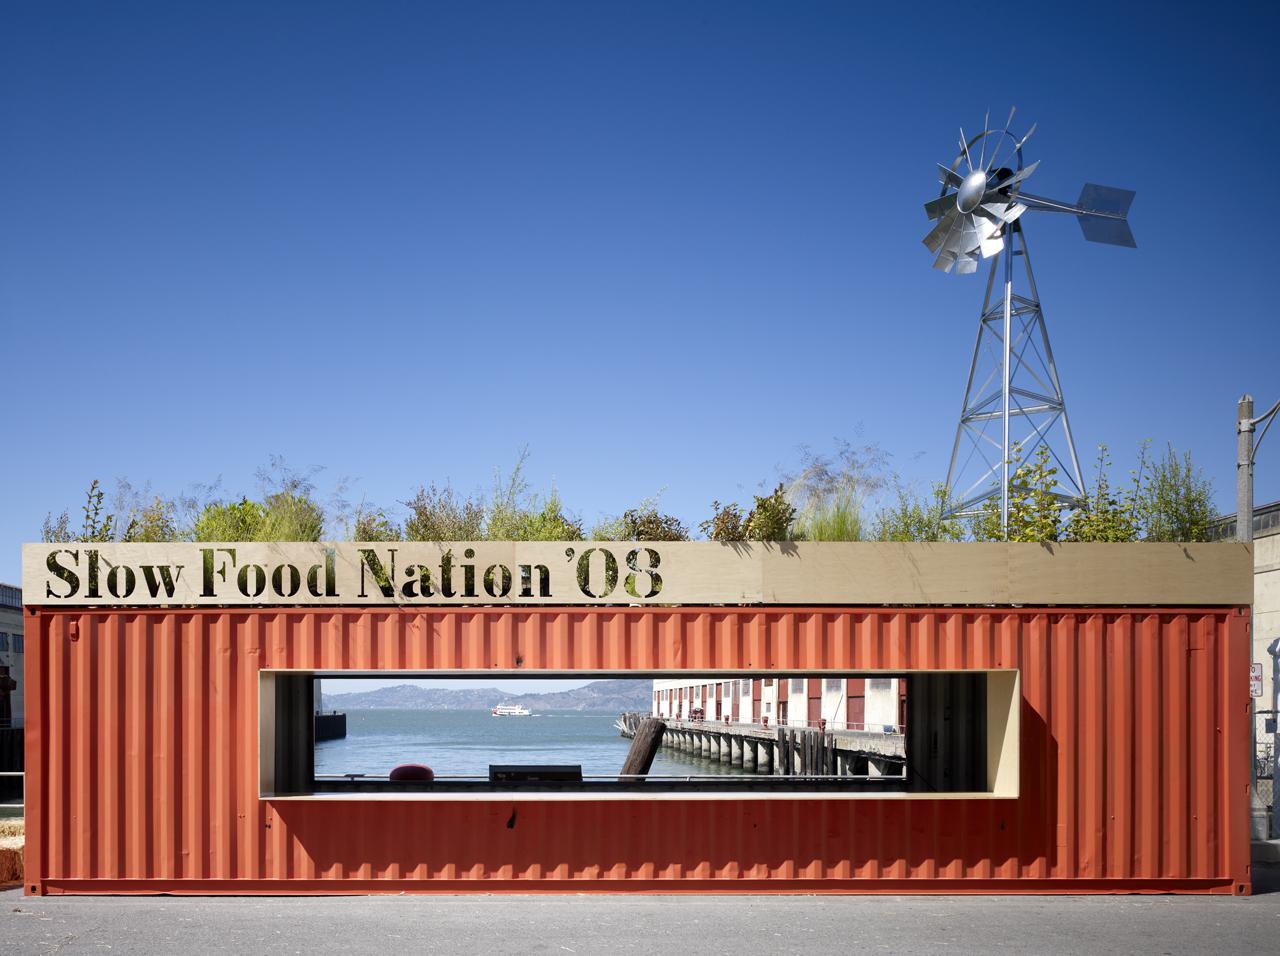 Slow Food Nation Welcome Pavilion / Jensen Architects, © Mark Darley